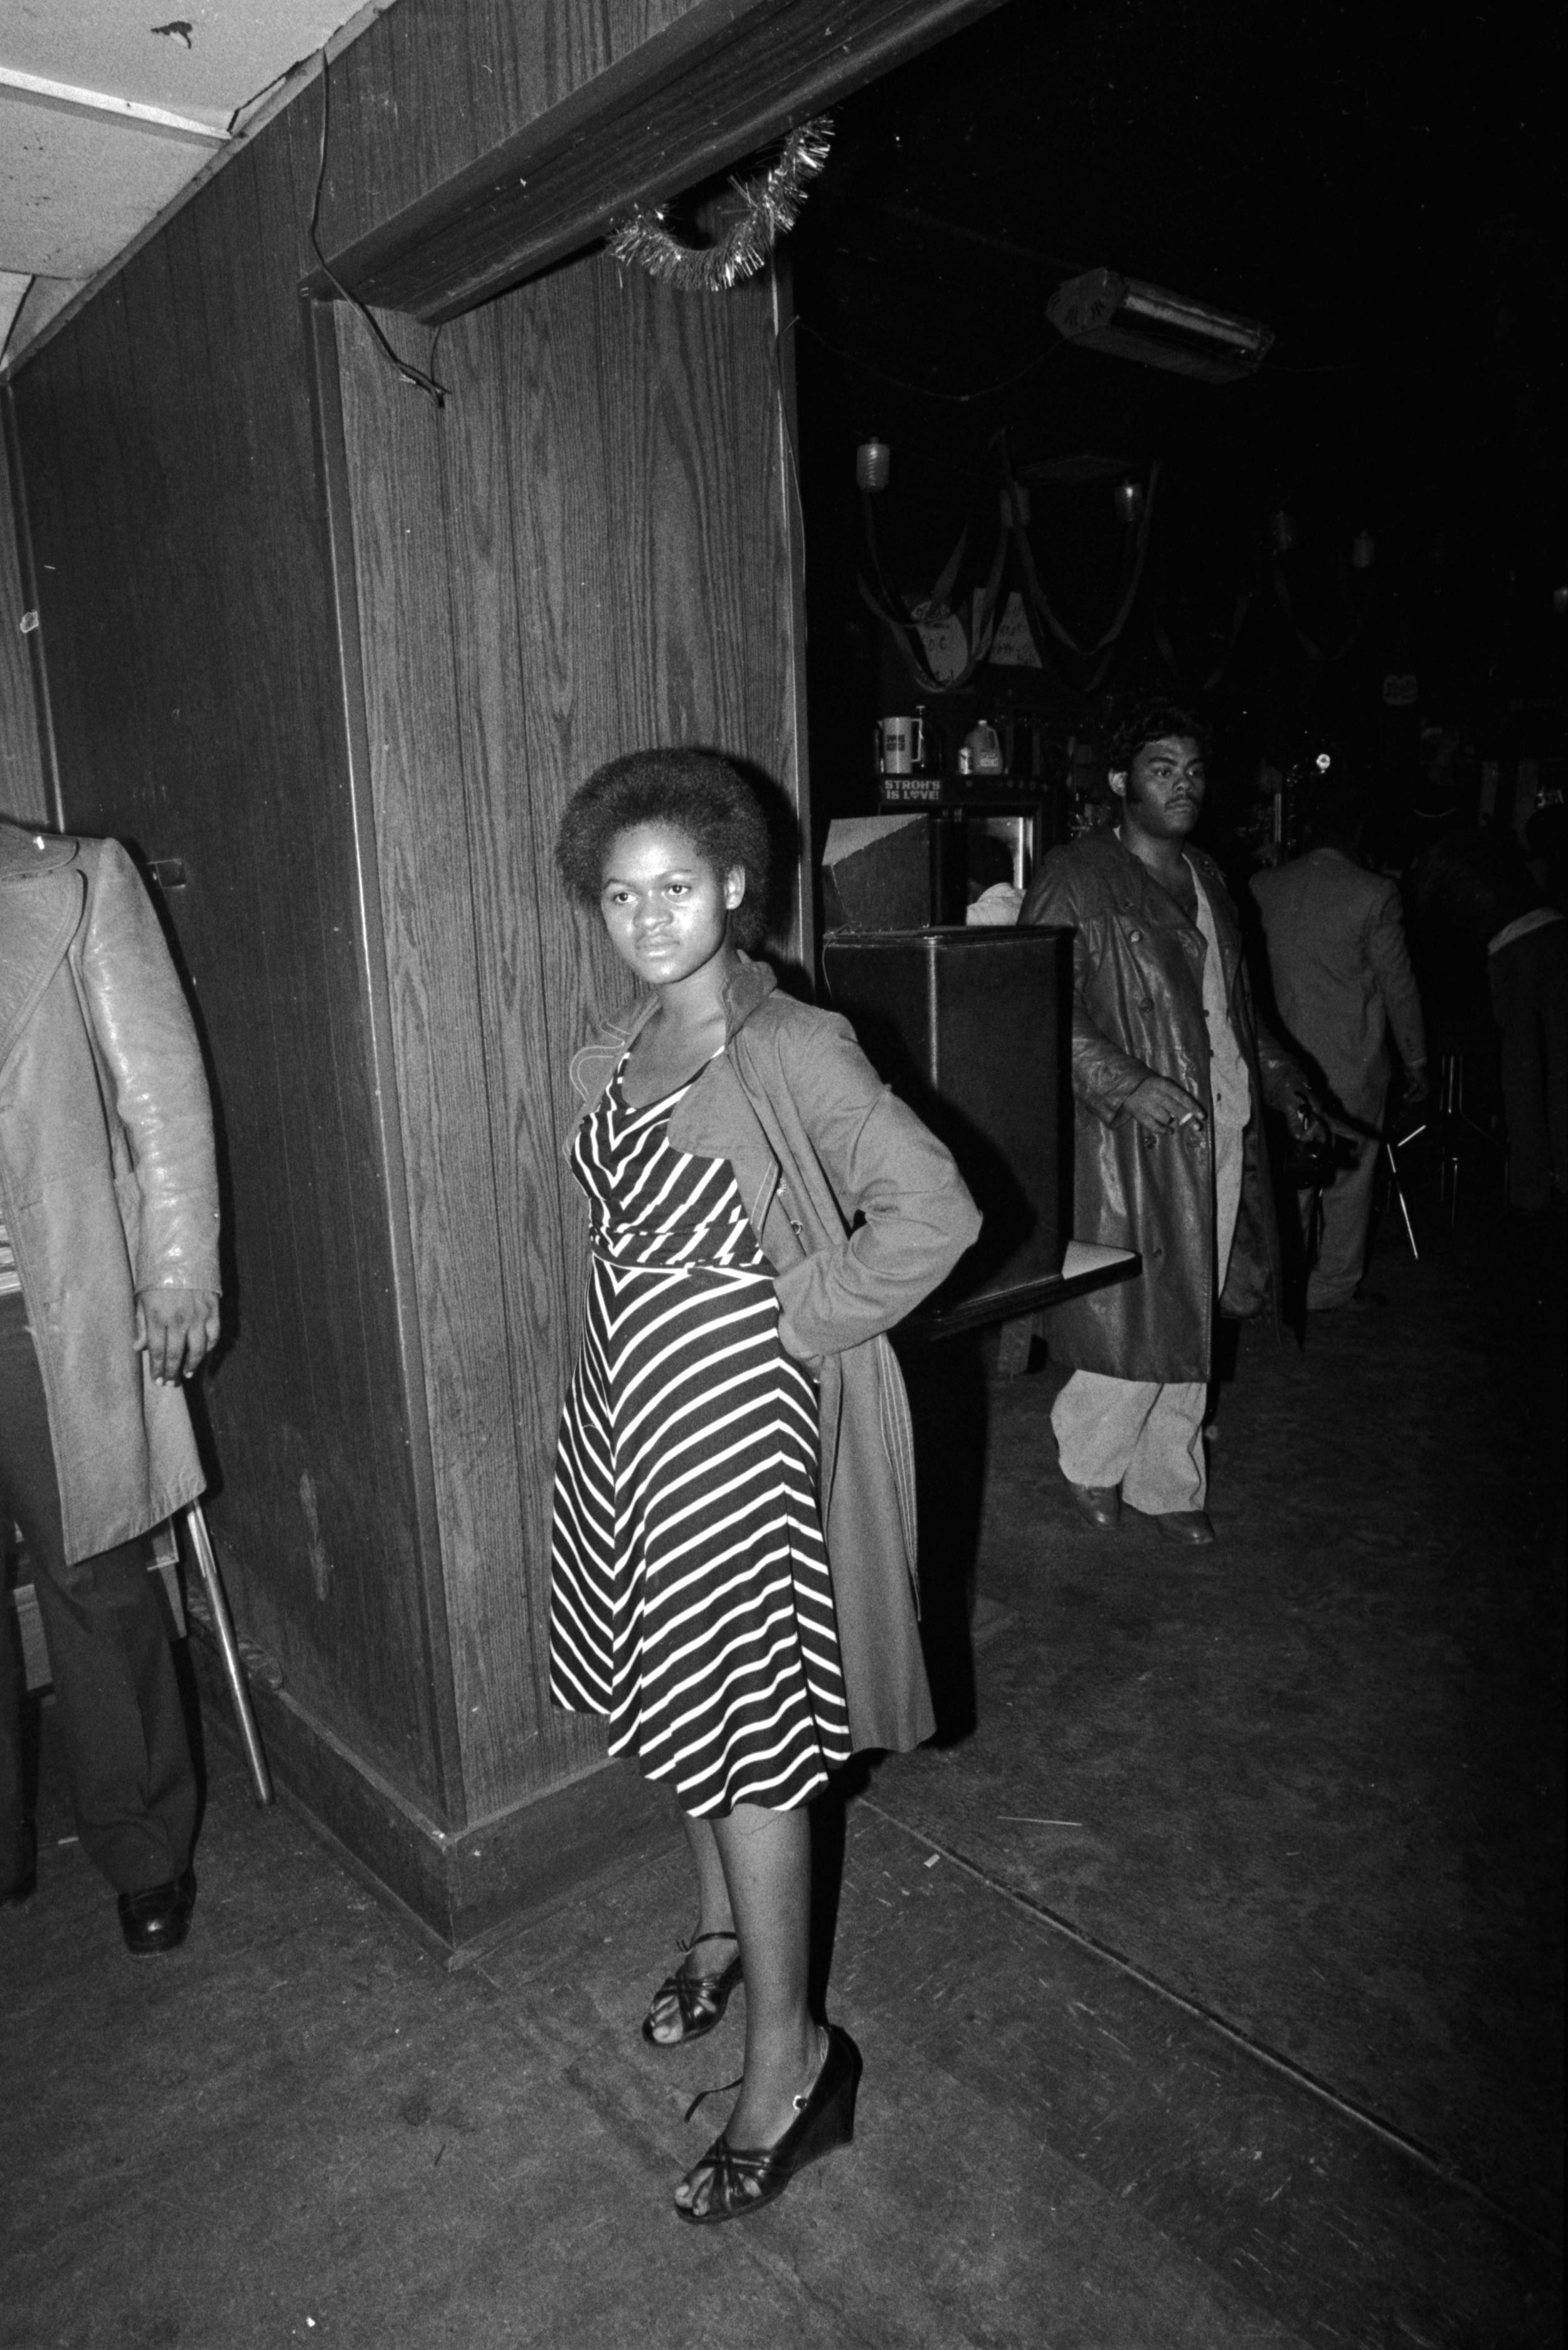 Woman in zebra dress.jpg